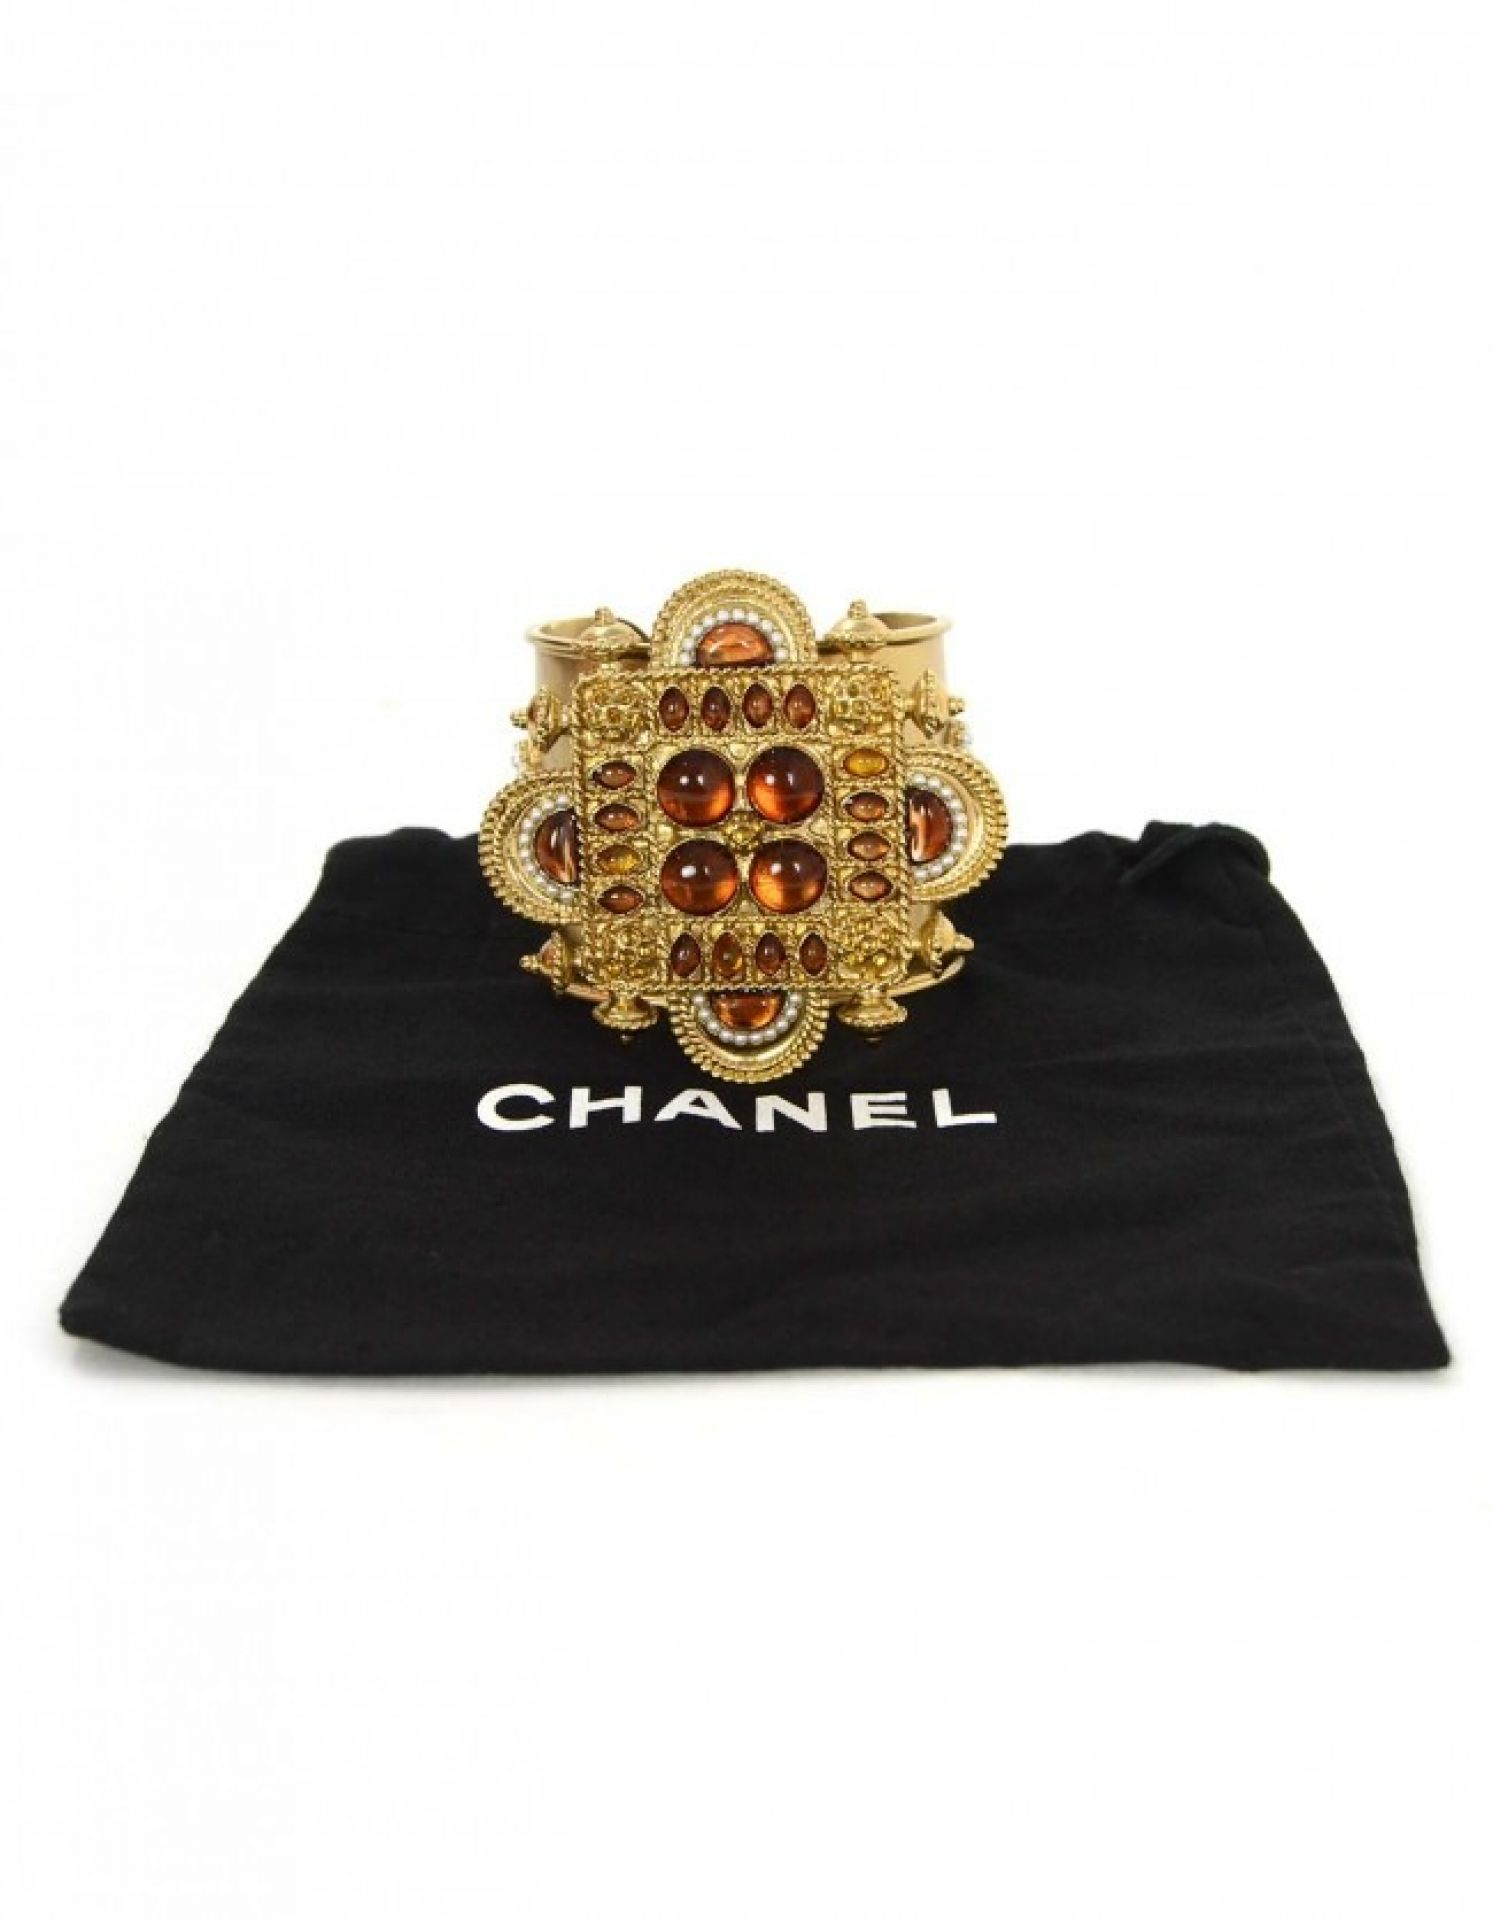 Chanel Gold & Amber Stone Cuff Bracelet